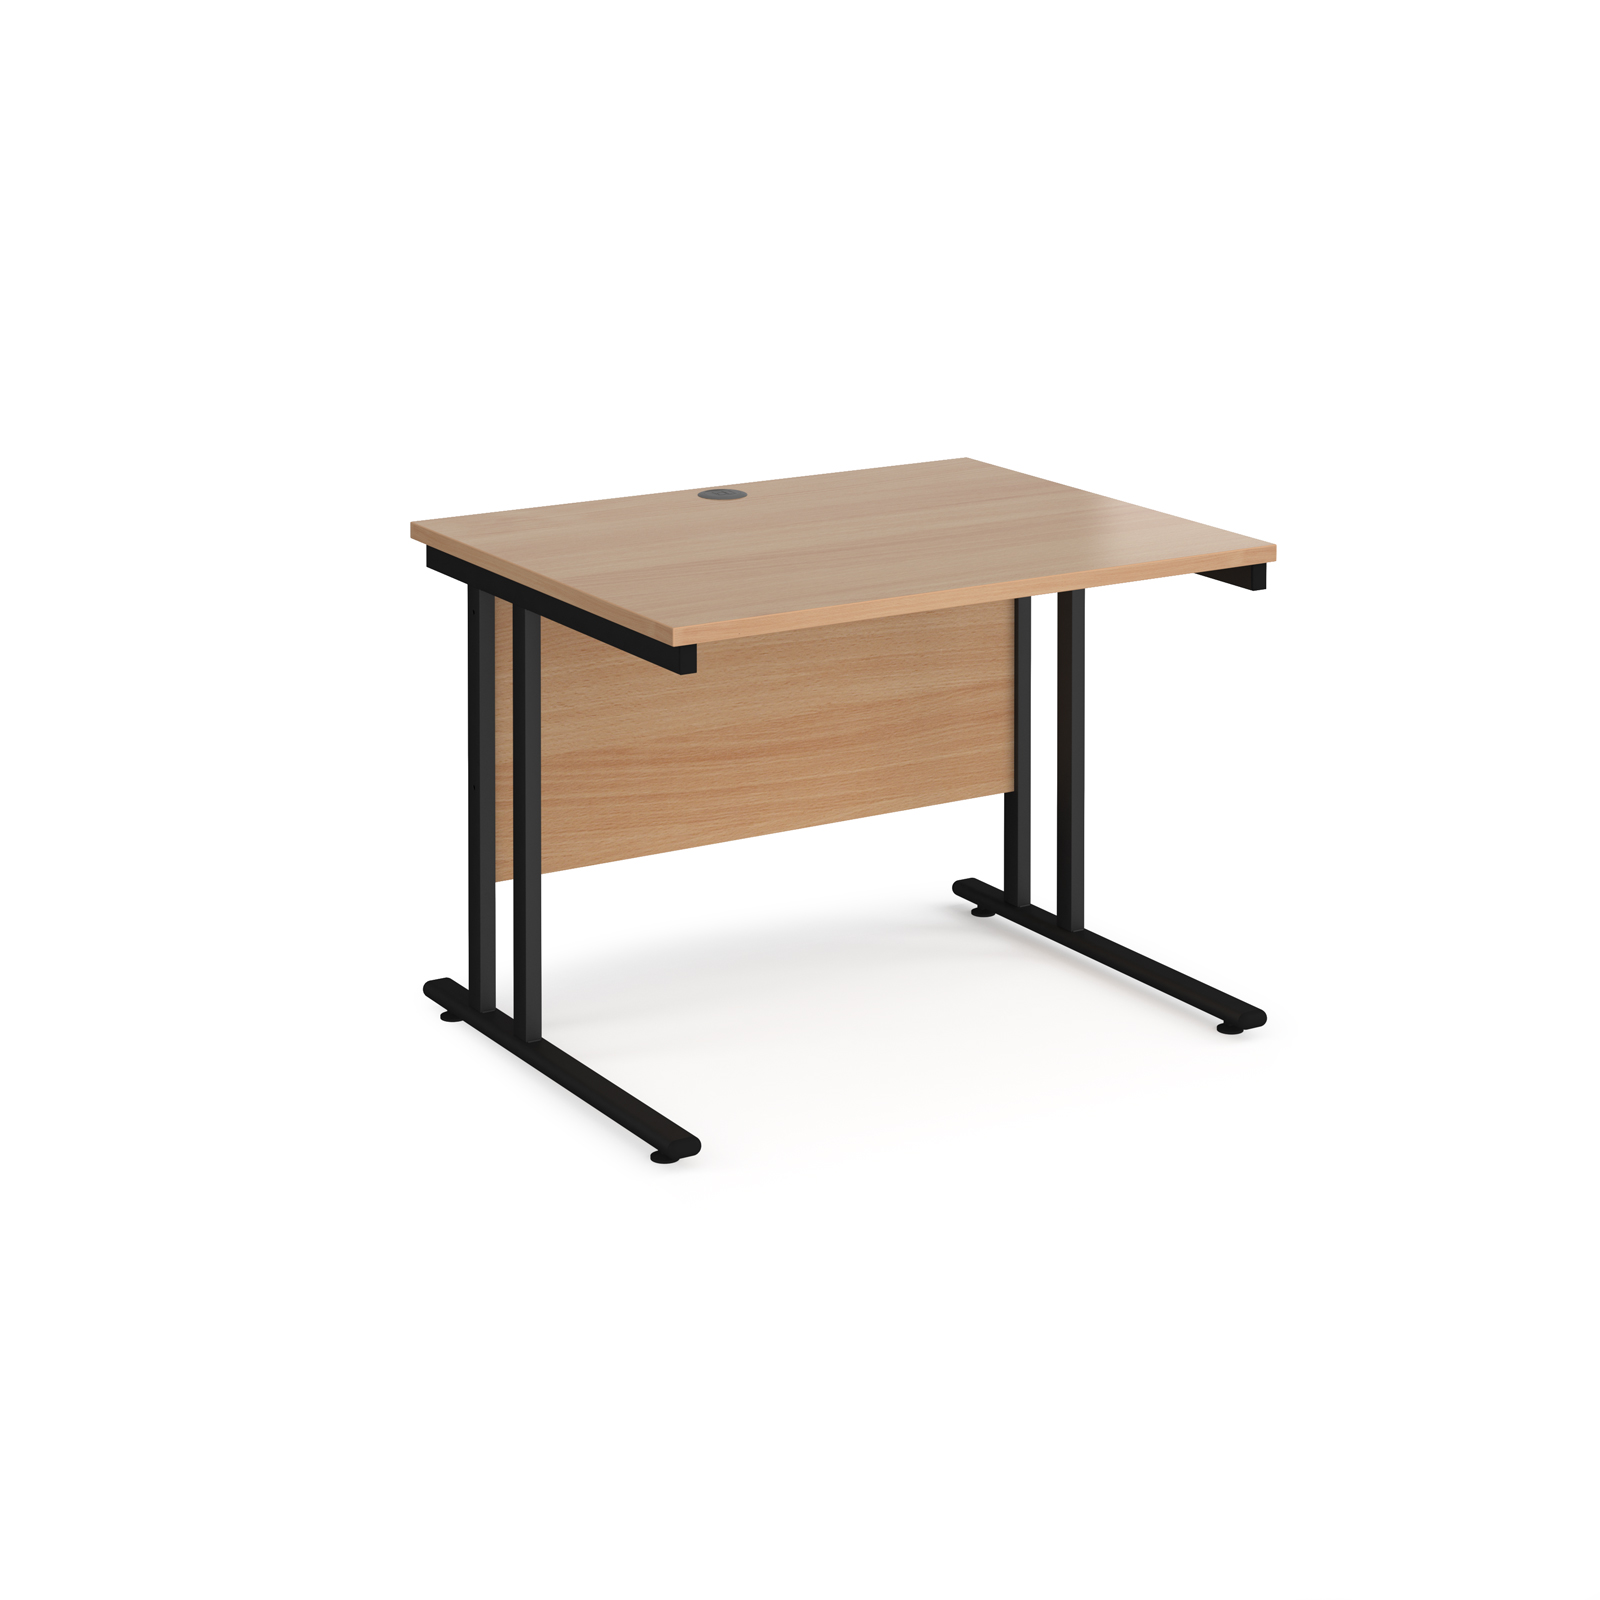 Desks Maestro 25 cantilever 800mm deep desk